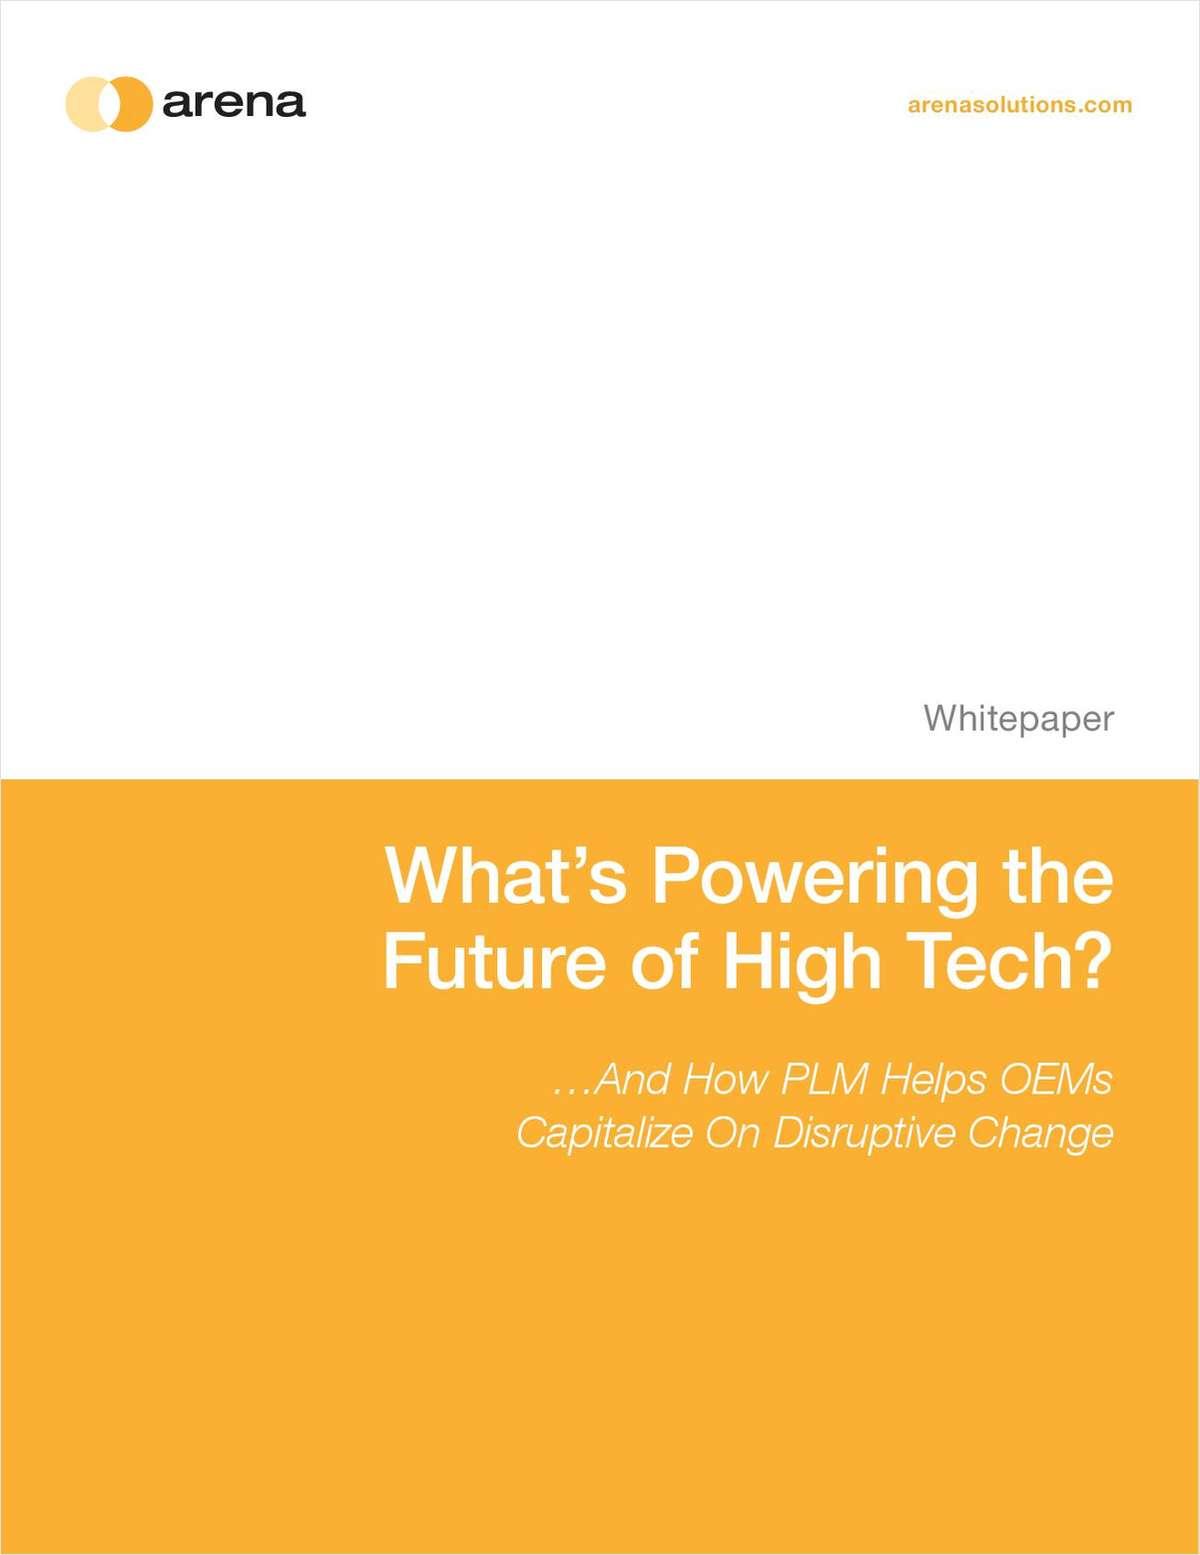 Turn Disruptive Changes Into High Tech's Next Big Thing